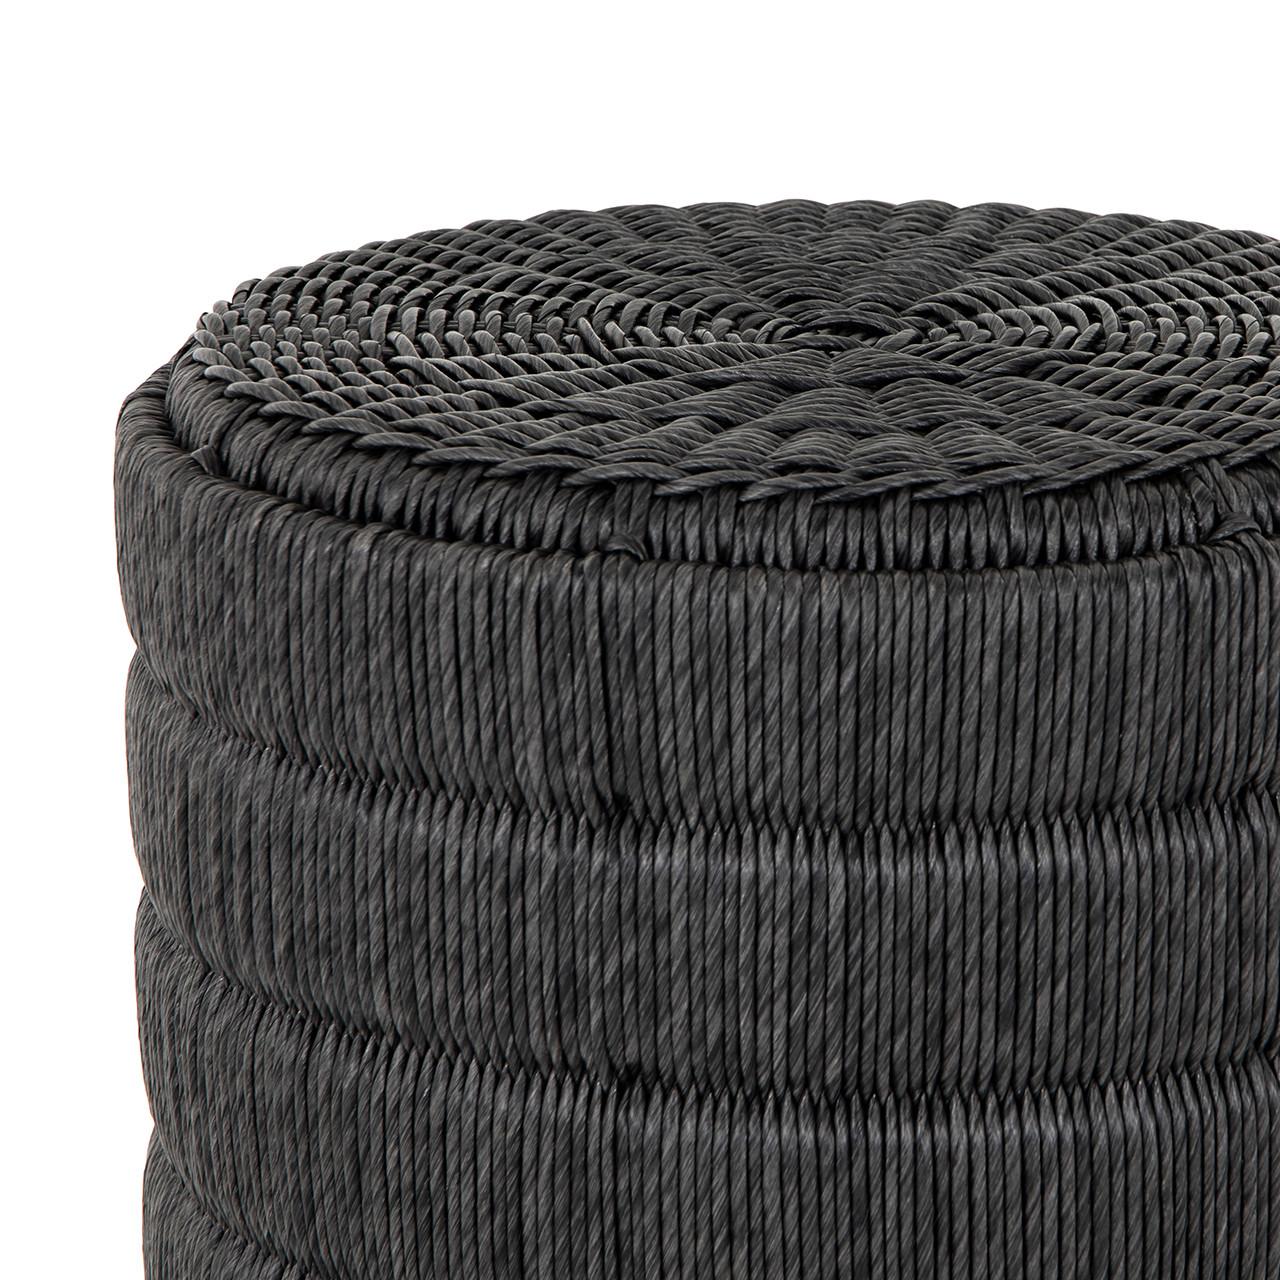 Madura End Table - Vintage Coal